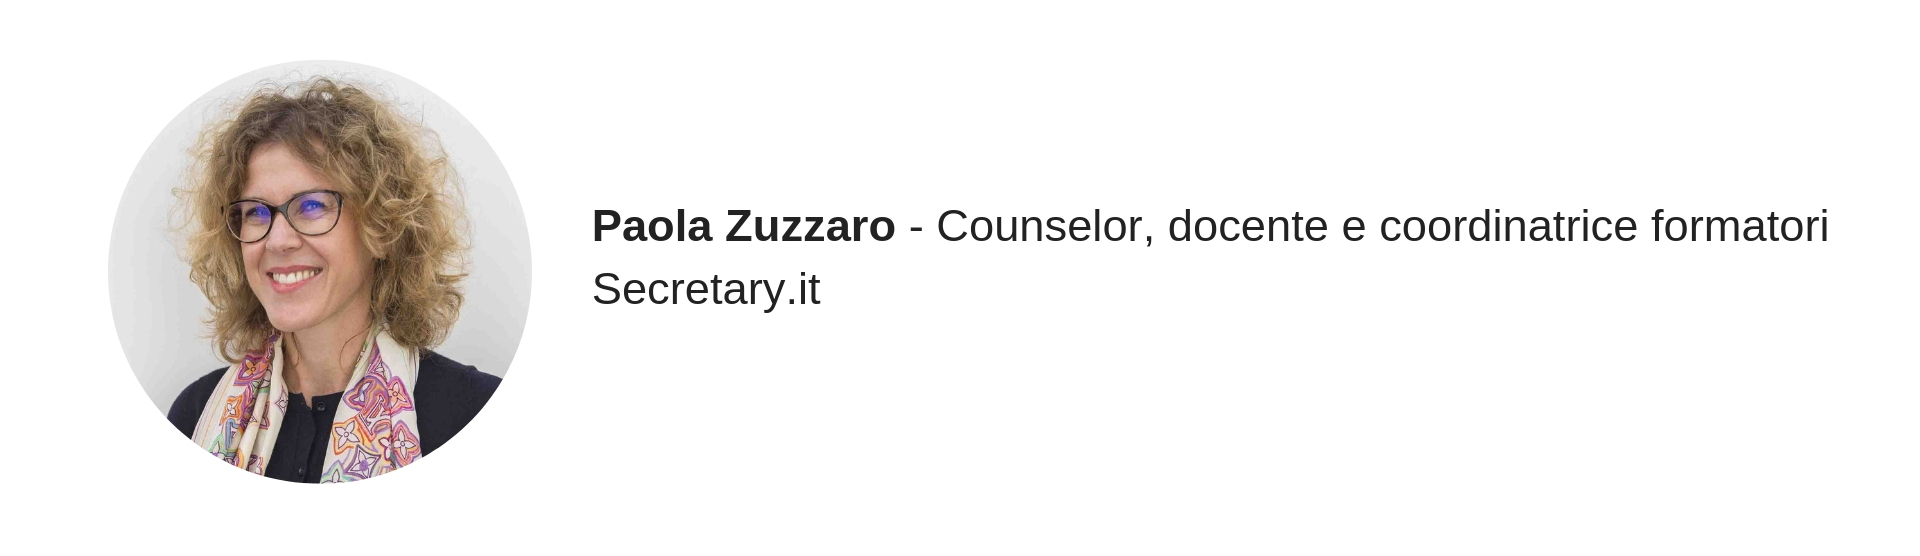 Paola Zuzzaro, trainer Secretary.it